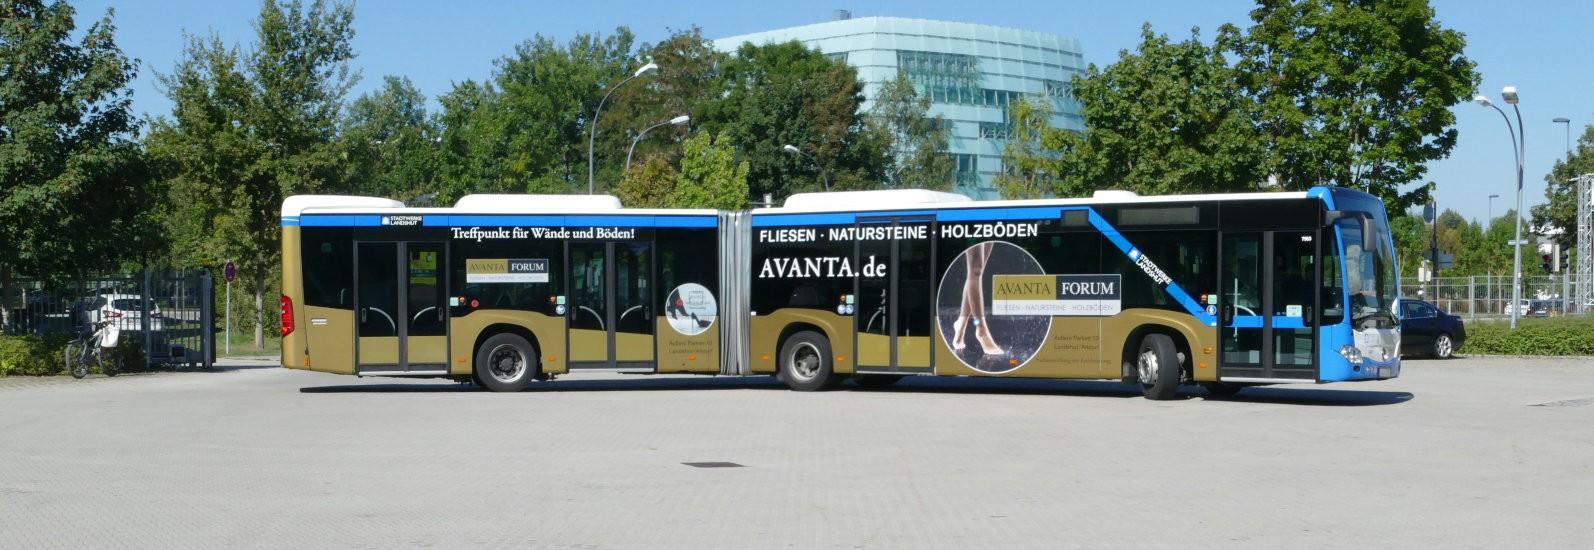 Buswerbung auf Gelenkbus